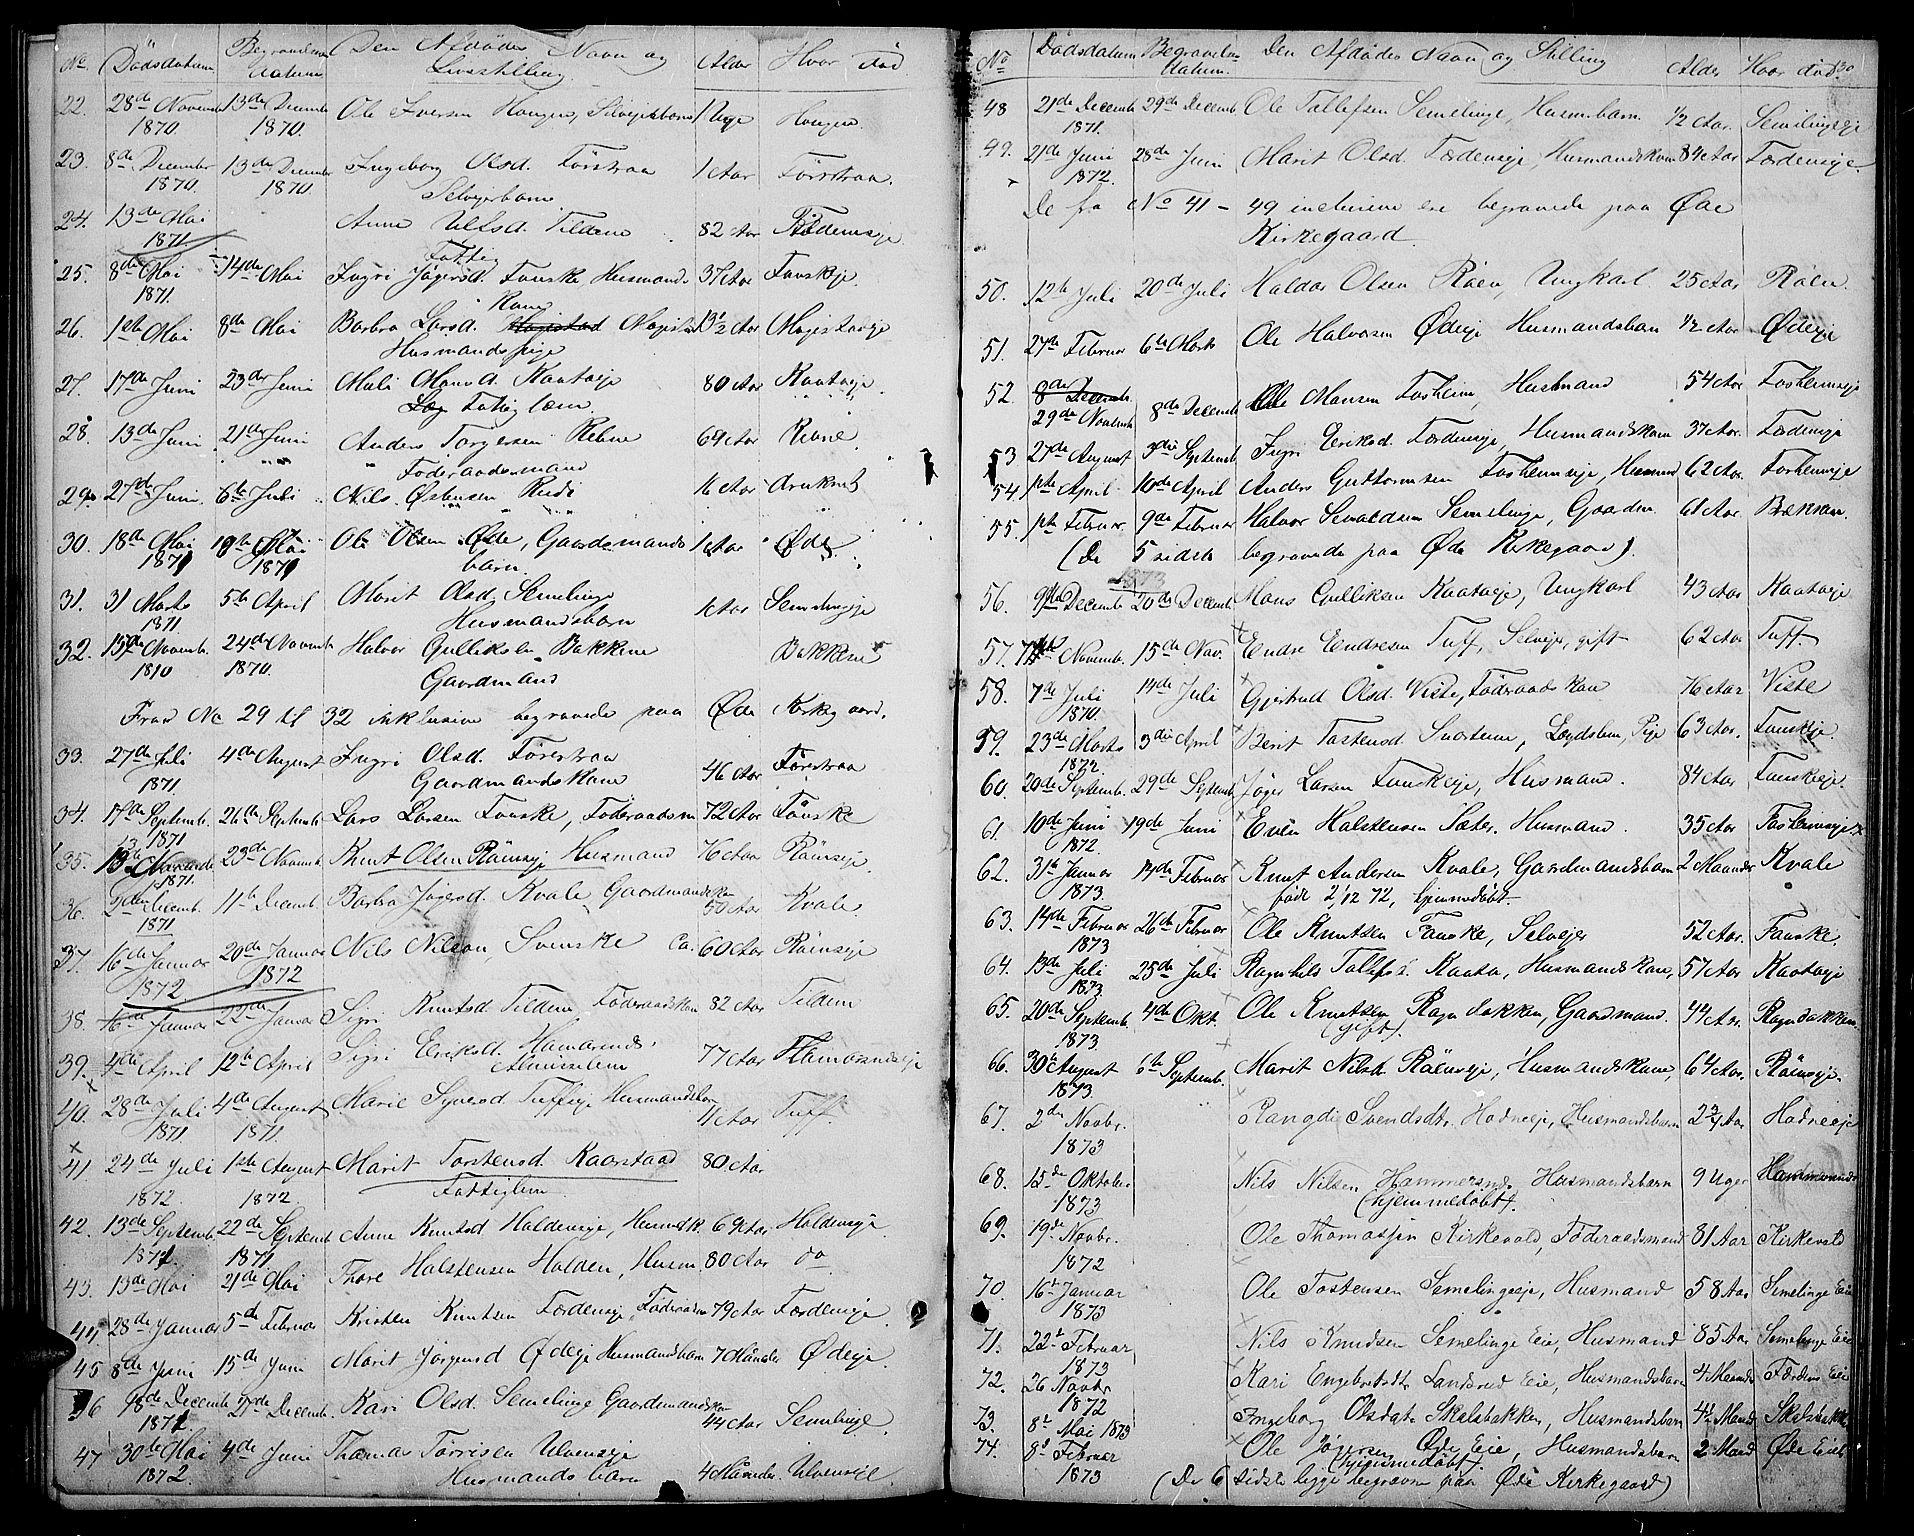 SAH, Vestre Slidre prestekontor, Klokkerbok nr. 3, 1869-1882, s. 130